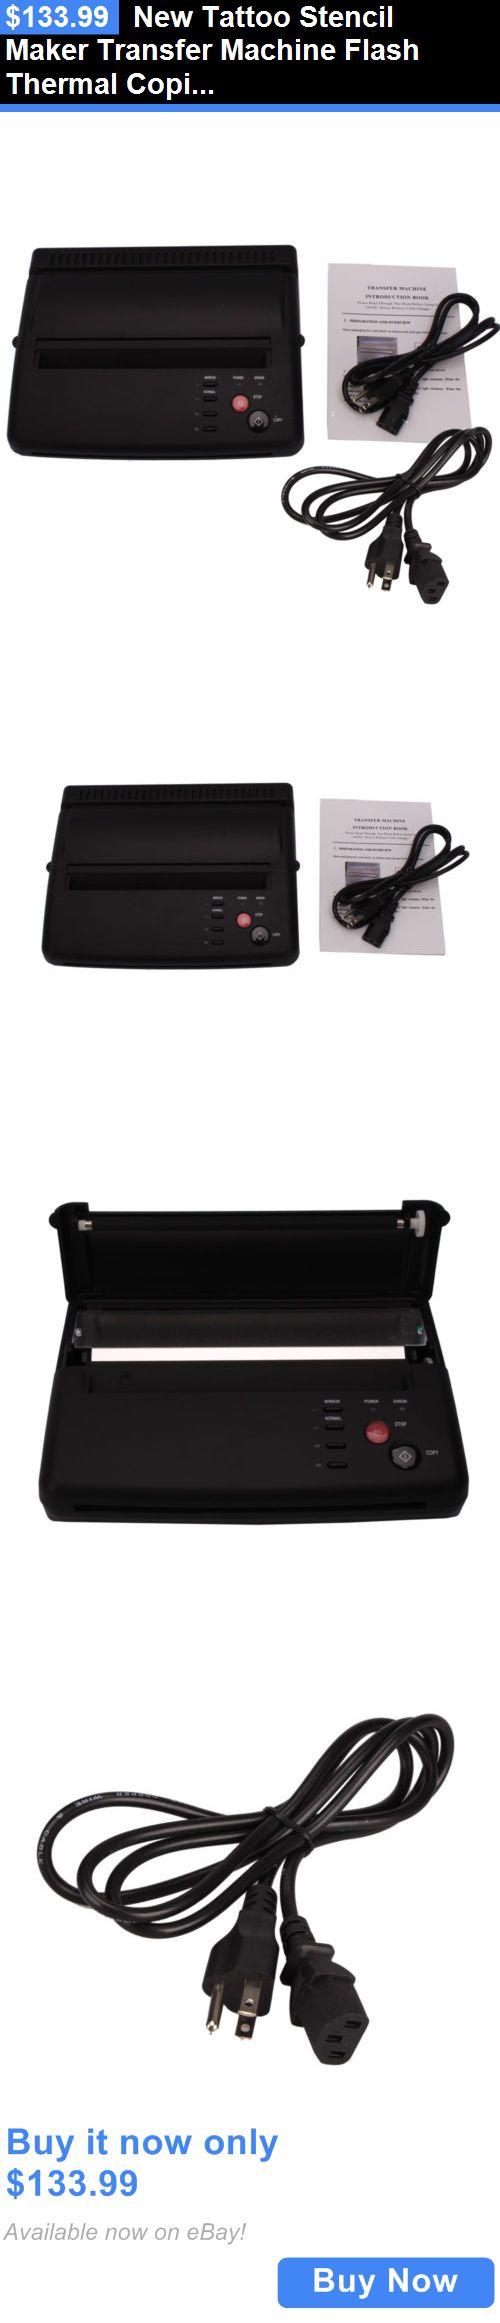 Tattoo Supplies: New Tattoo Stencil Maker Transfer Machine Flash Thermal Copier Printer Supplies BUY IT NOW ONLY: $133.99